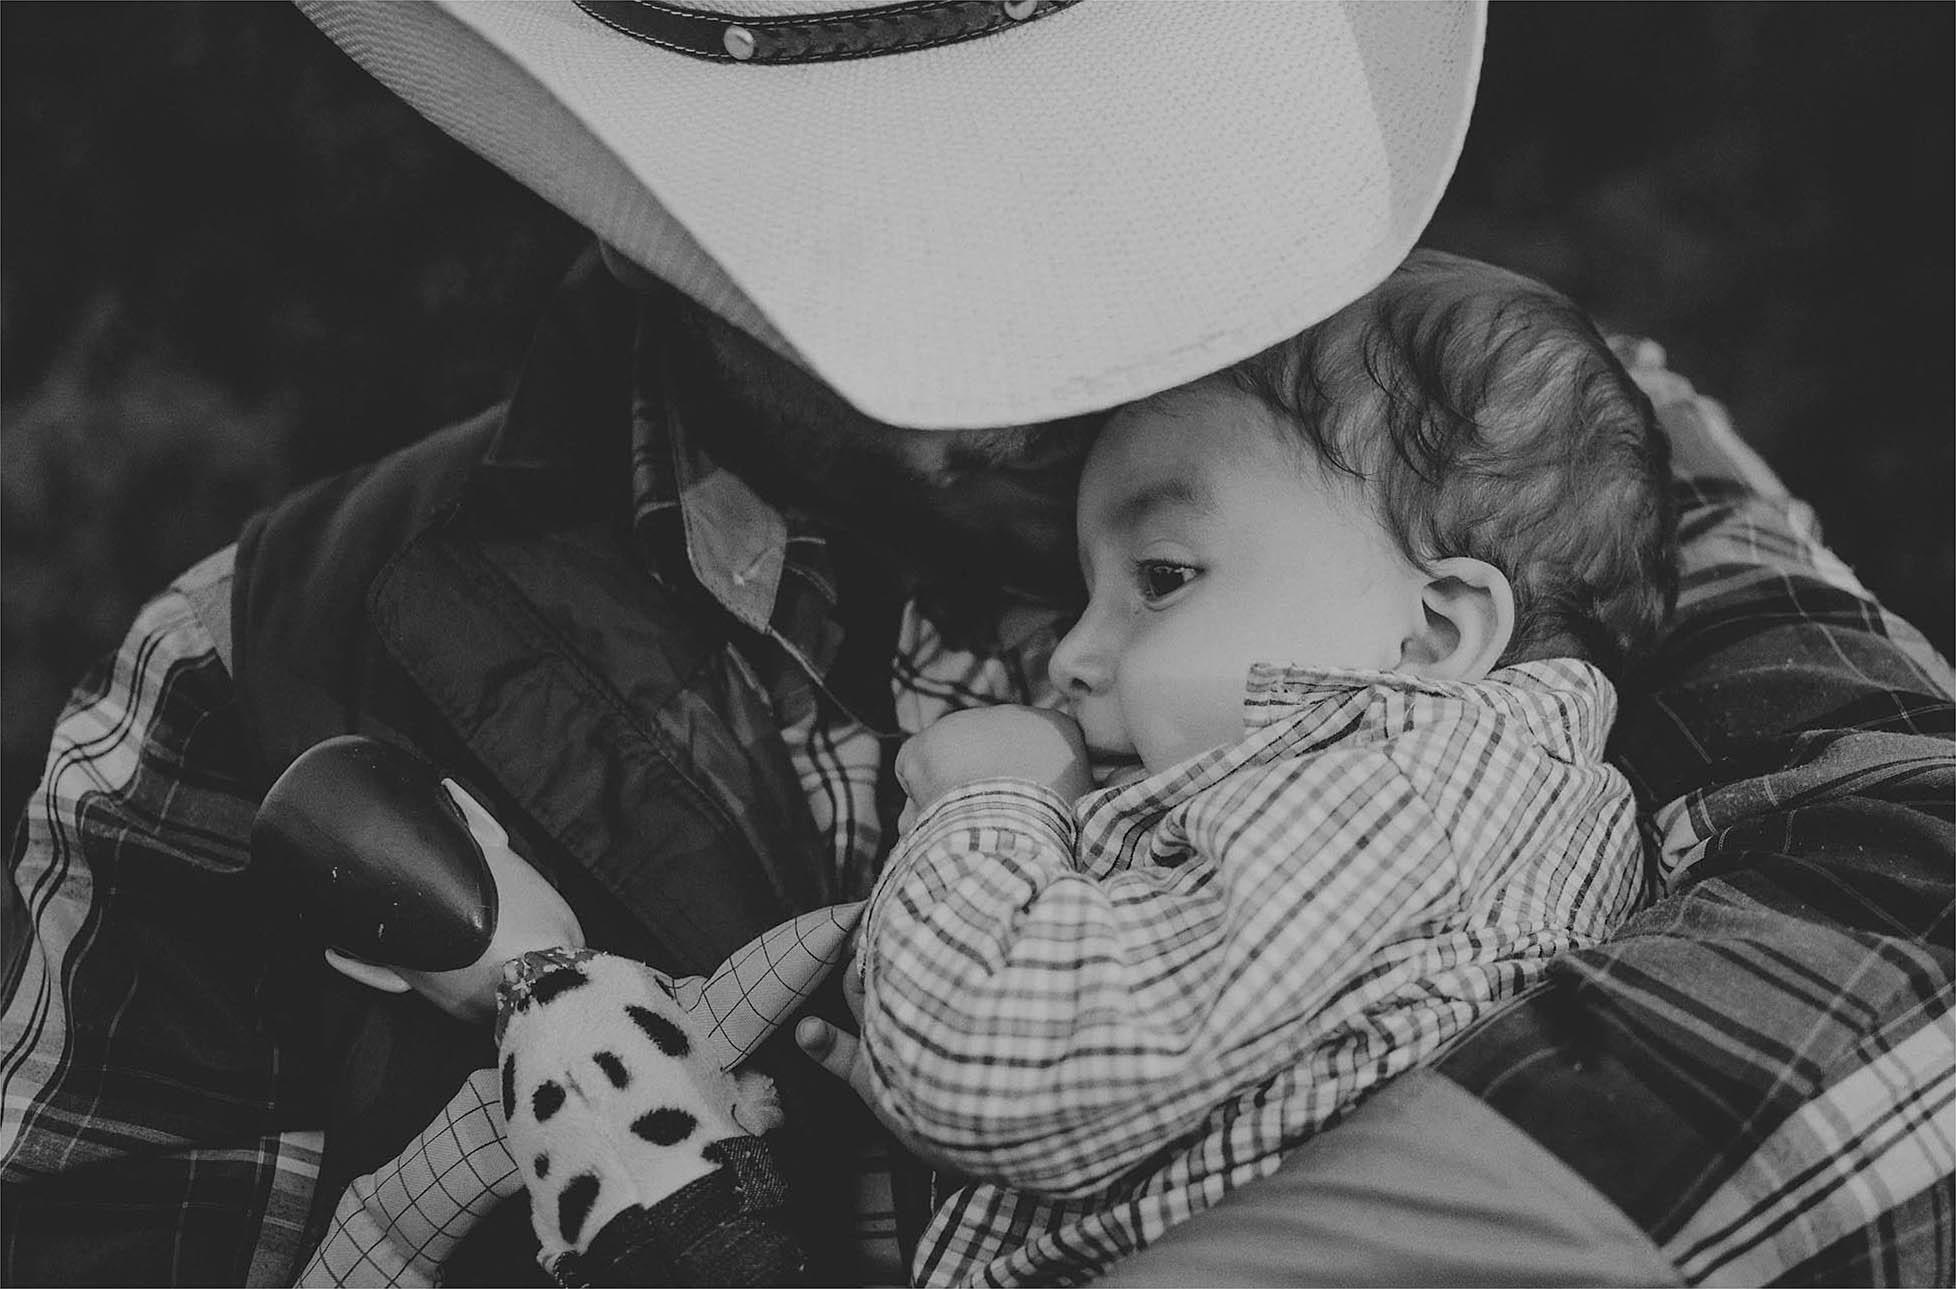 fotografo-de-familia-Queretaro-Román-4.jpg